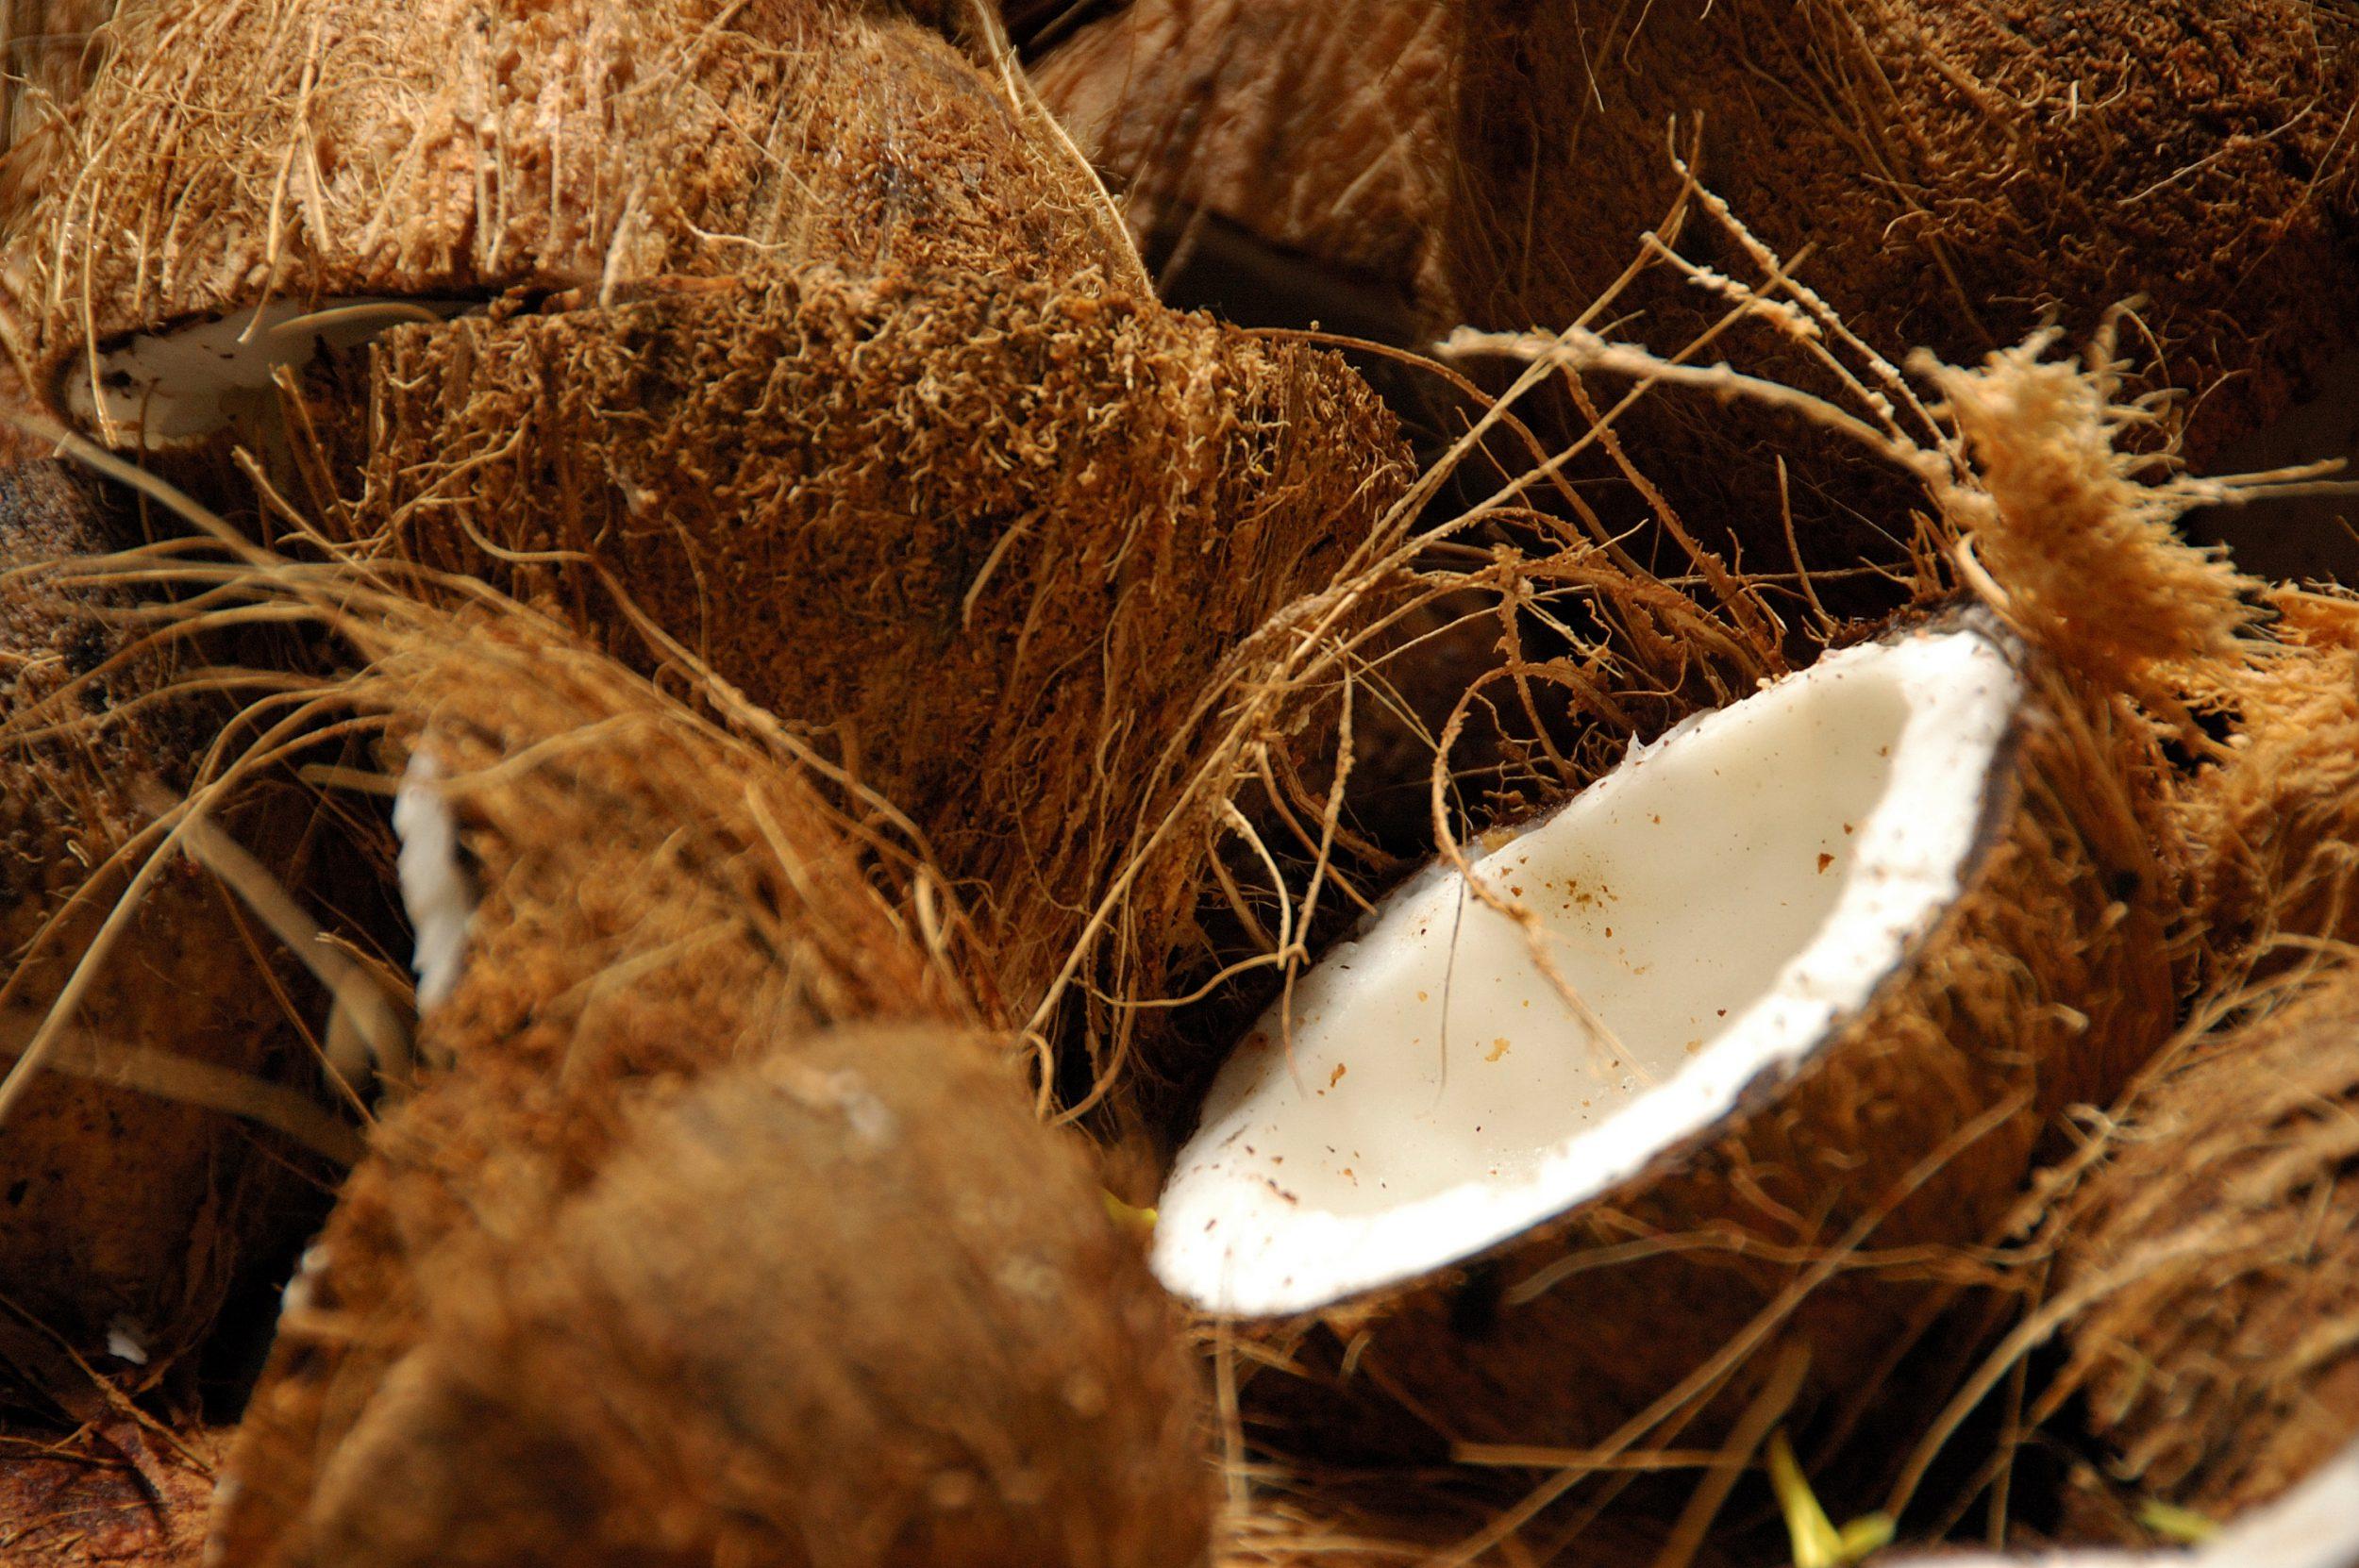 A split coconut